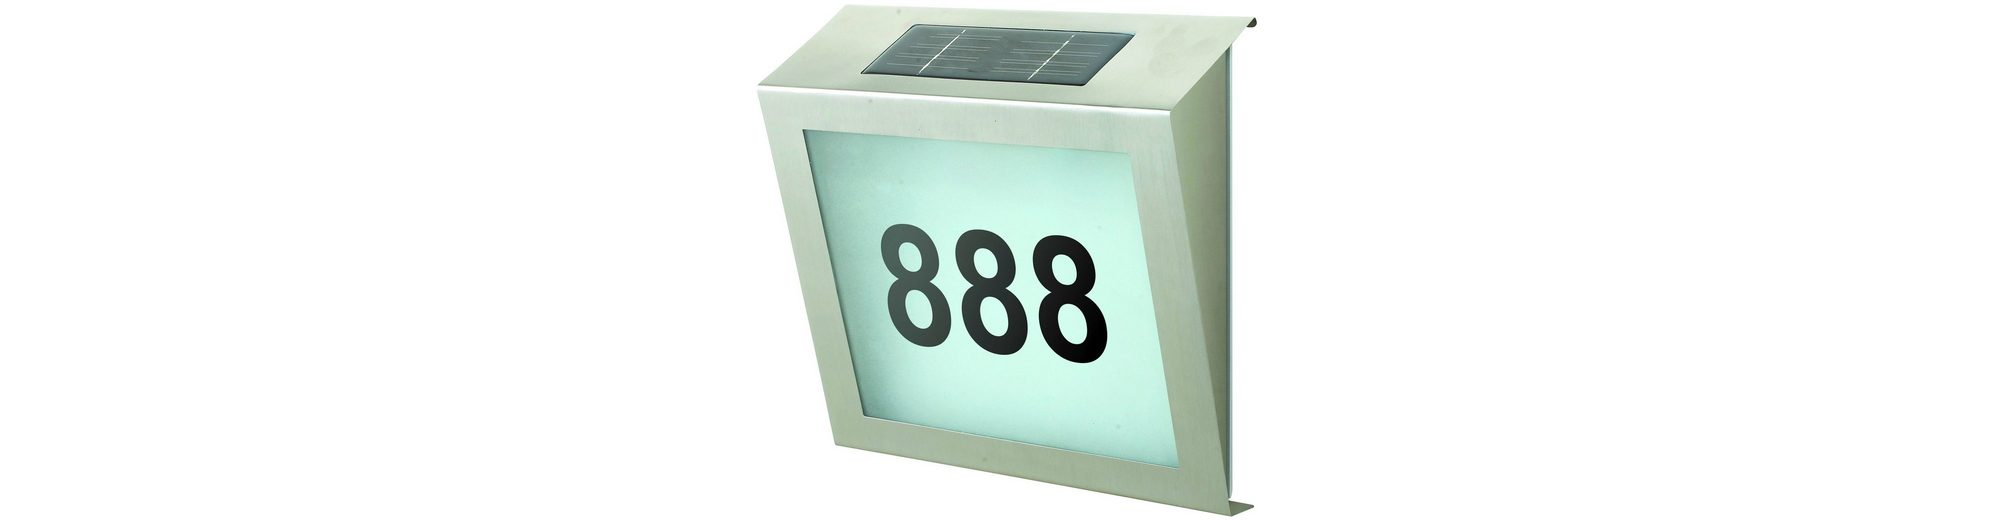 Solar Hausnummernleuchte